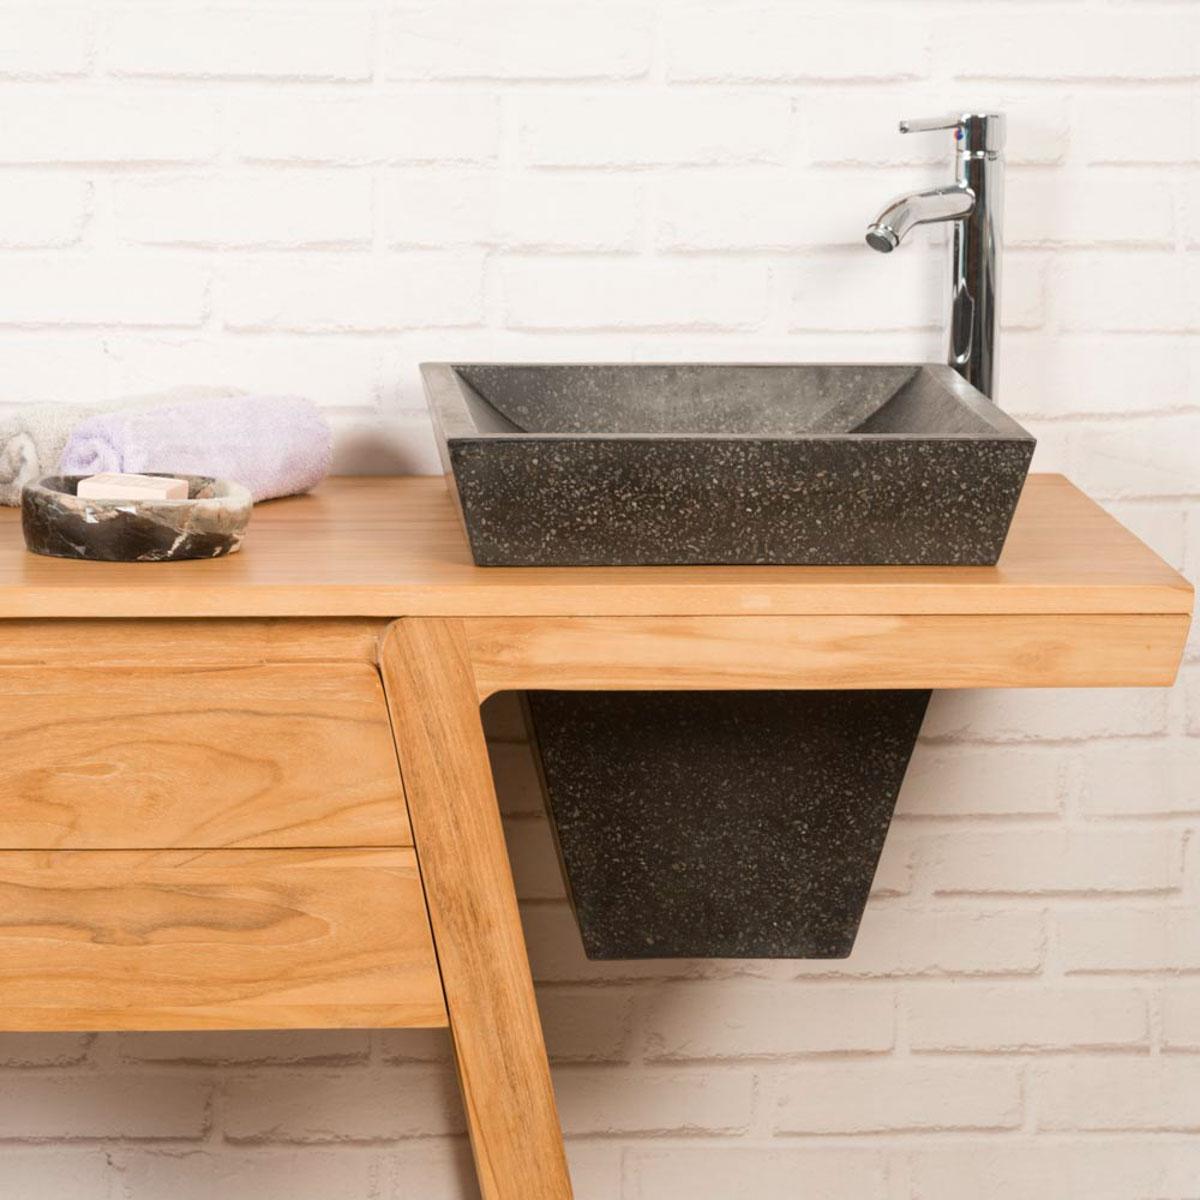 Meuble salle de bain meuble sous vasque teck kh ops 140 cm - Meuble sous evier 140 cm ...